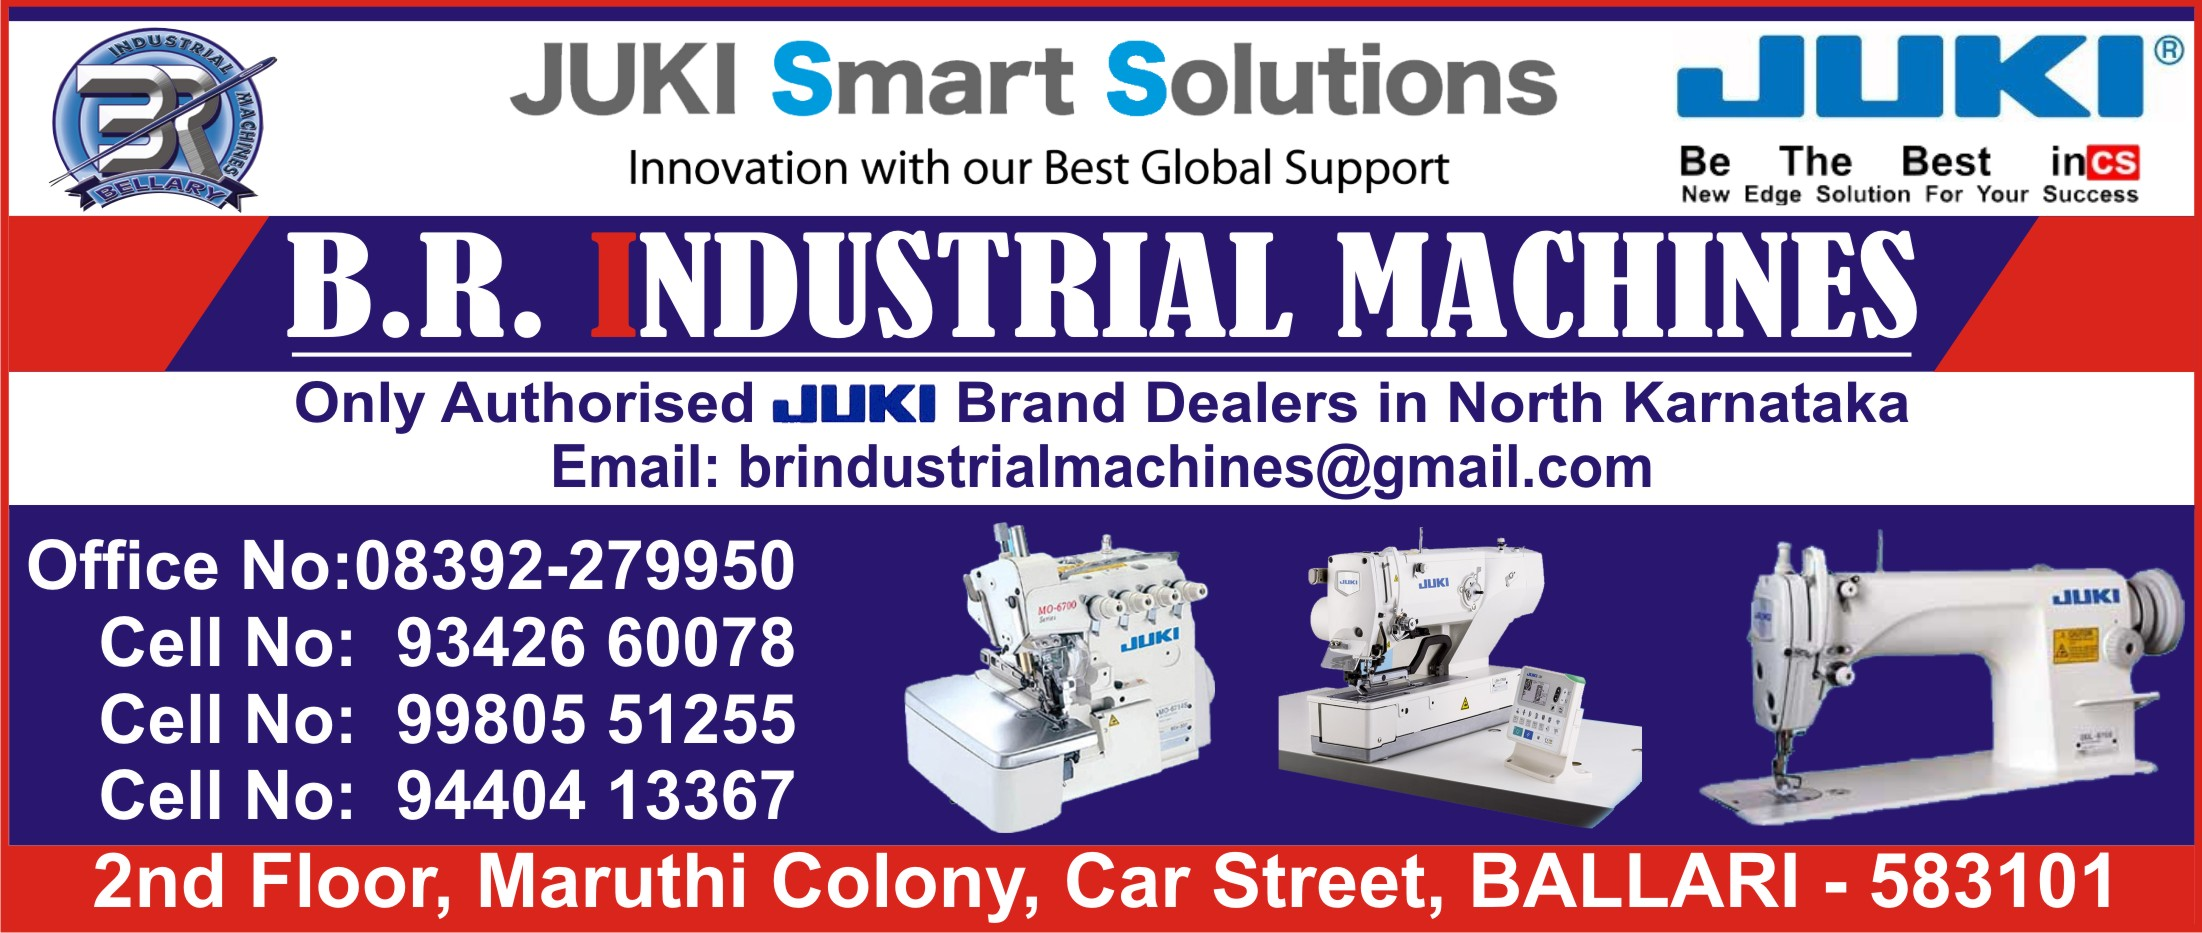 B.R. INDUSTRIAL MACHINES